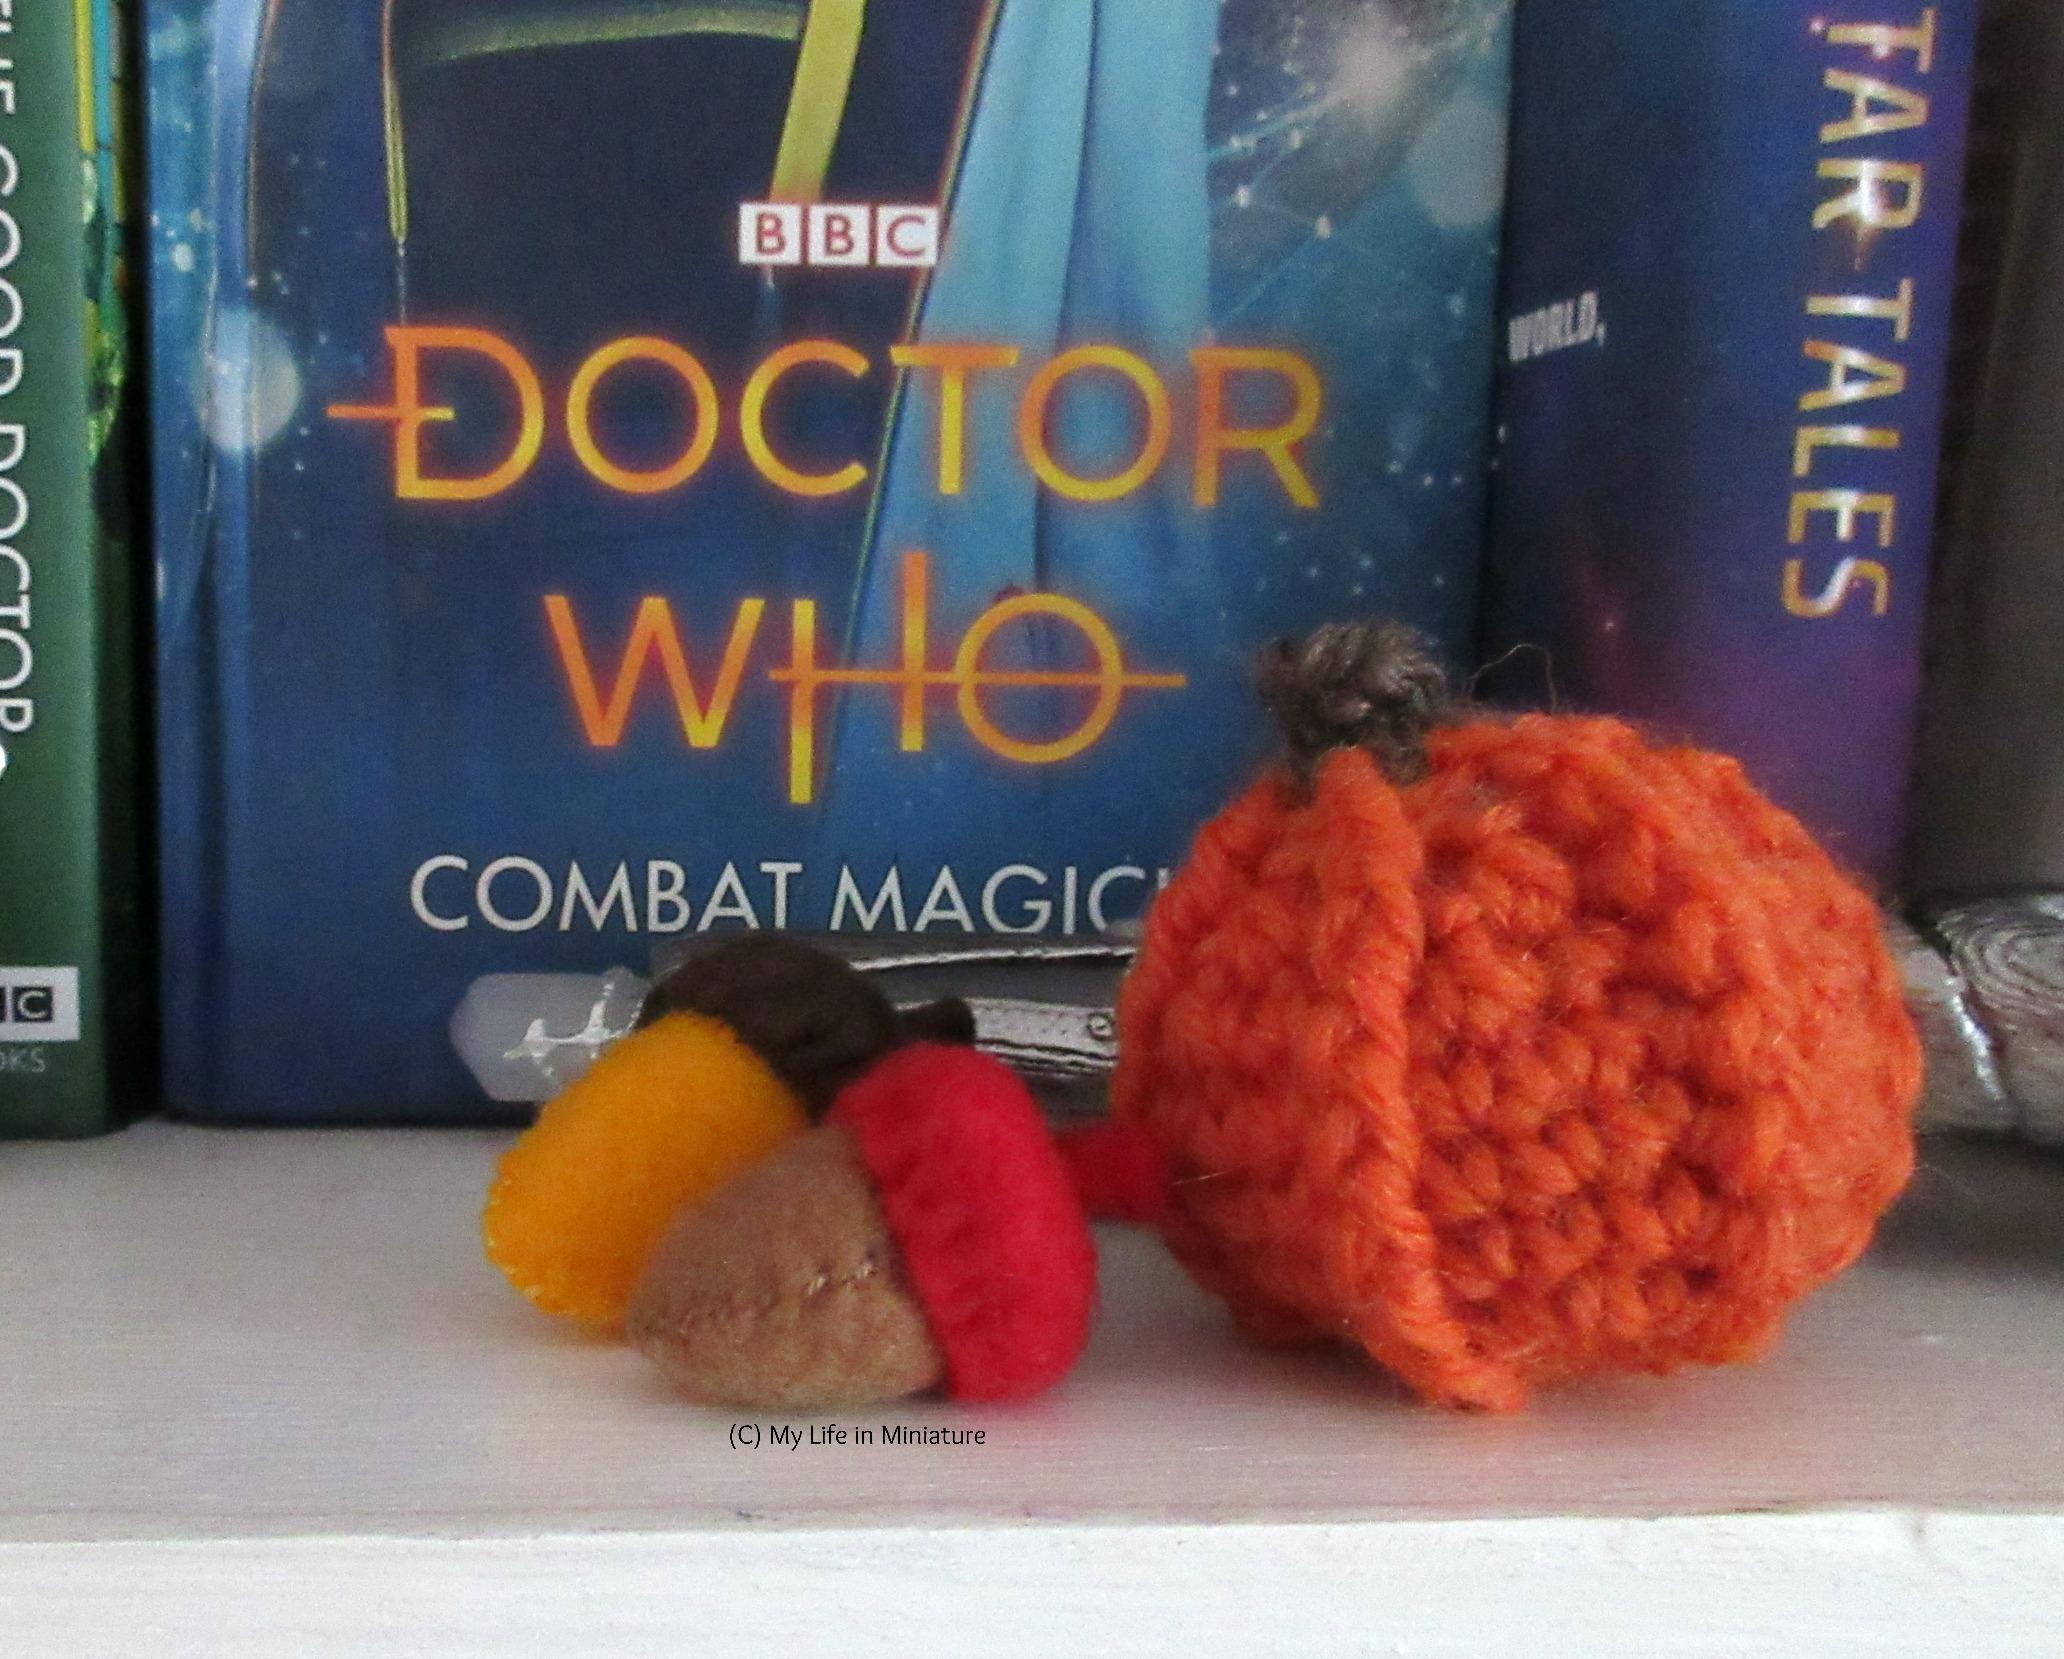 Two felt acorns sit on a bookshelf, next to a crocheted orange pumpkin.